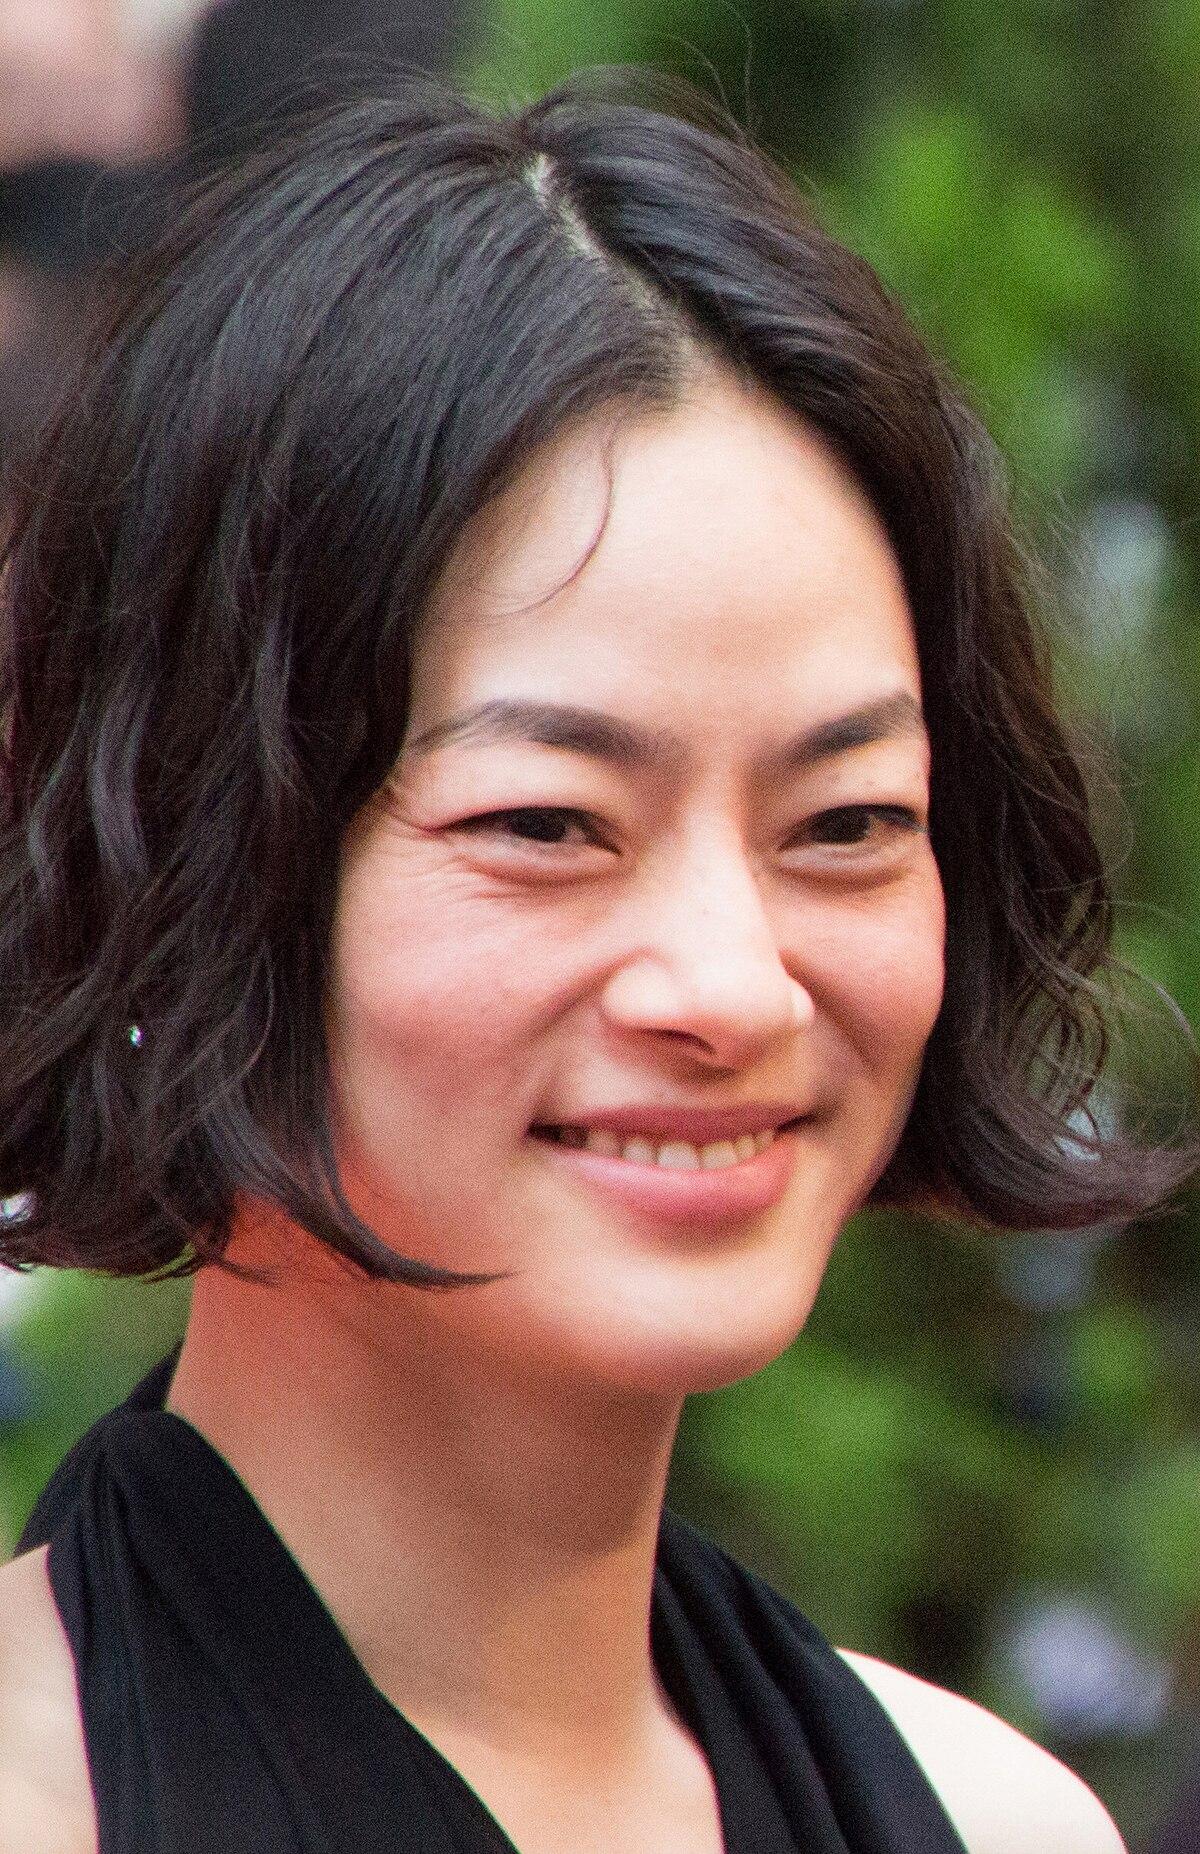 Hot Yui Ichikawa (b. 1986 Later became an actress naked photo 2017